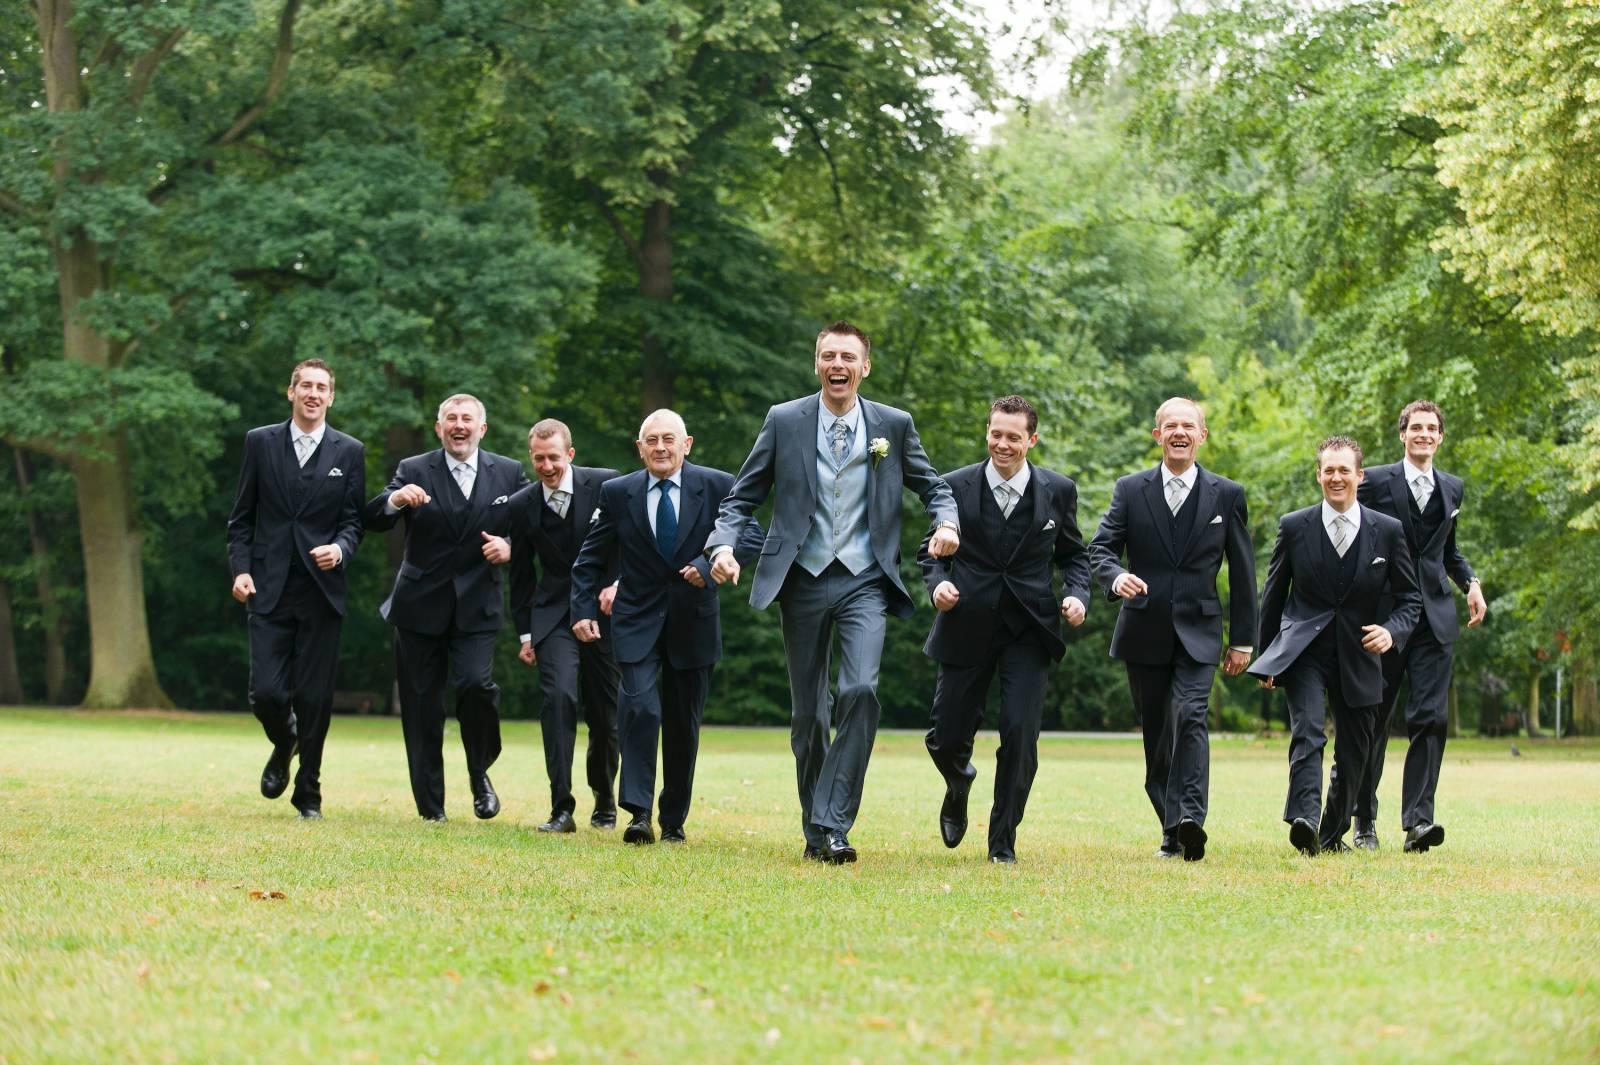 Foto Meeuw - House of Weddings - 2